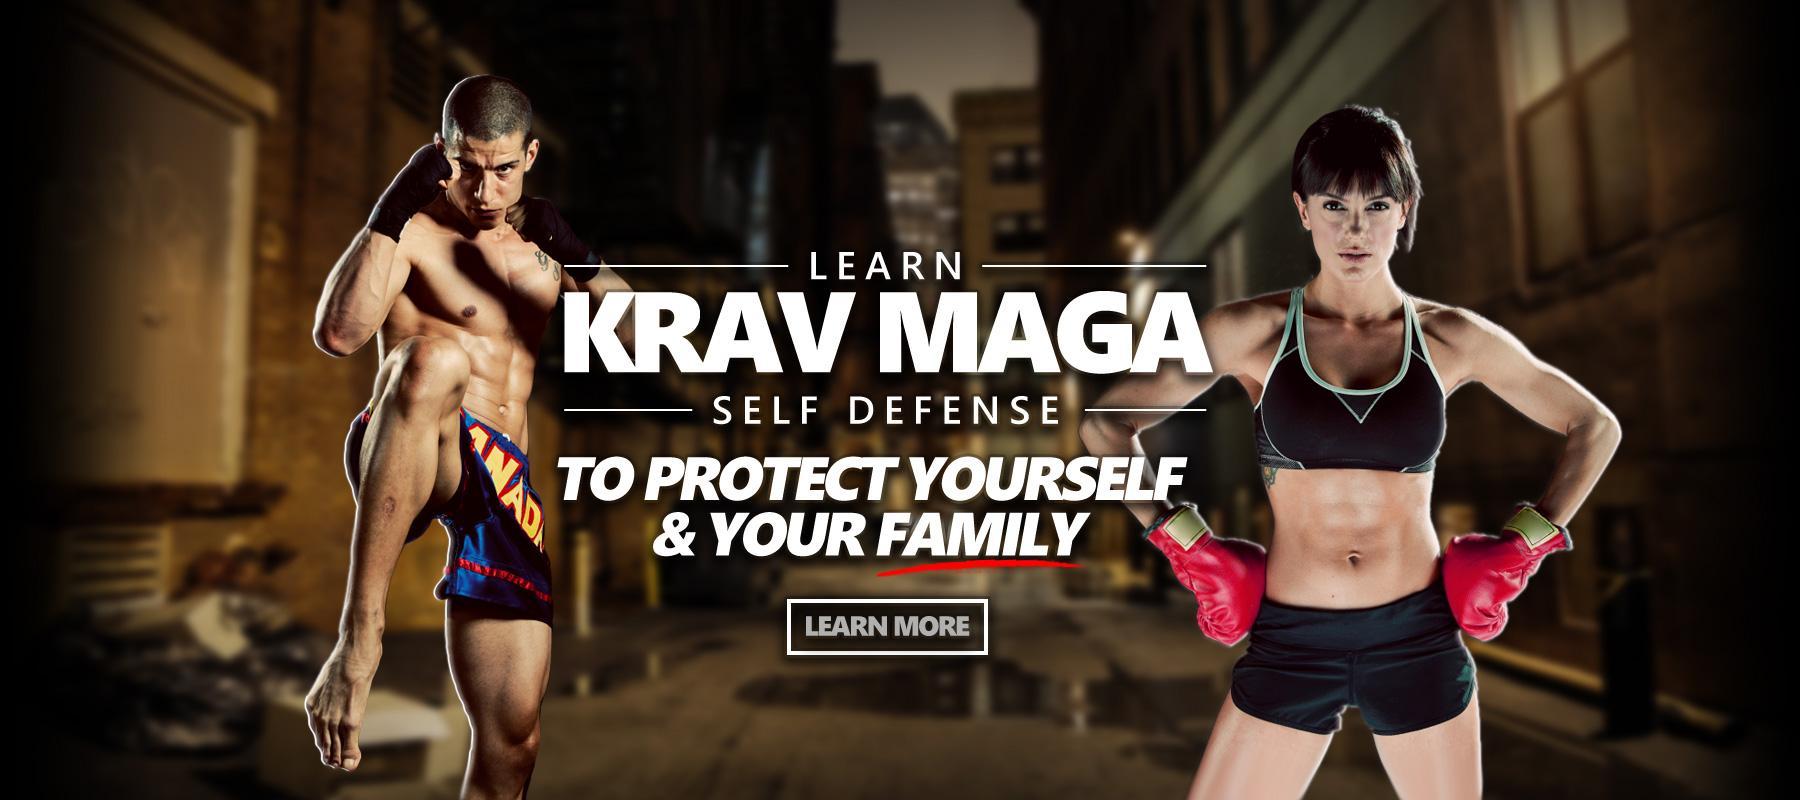 self defense classes prices